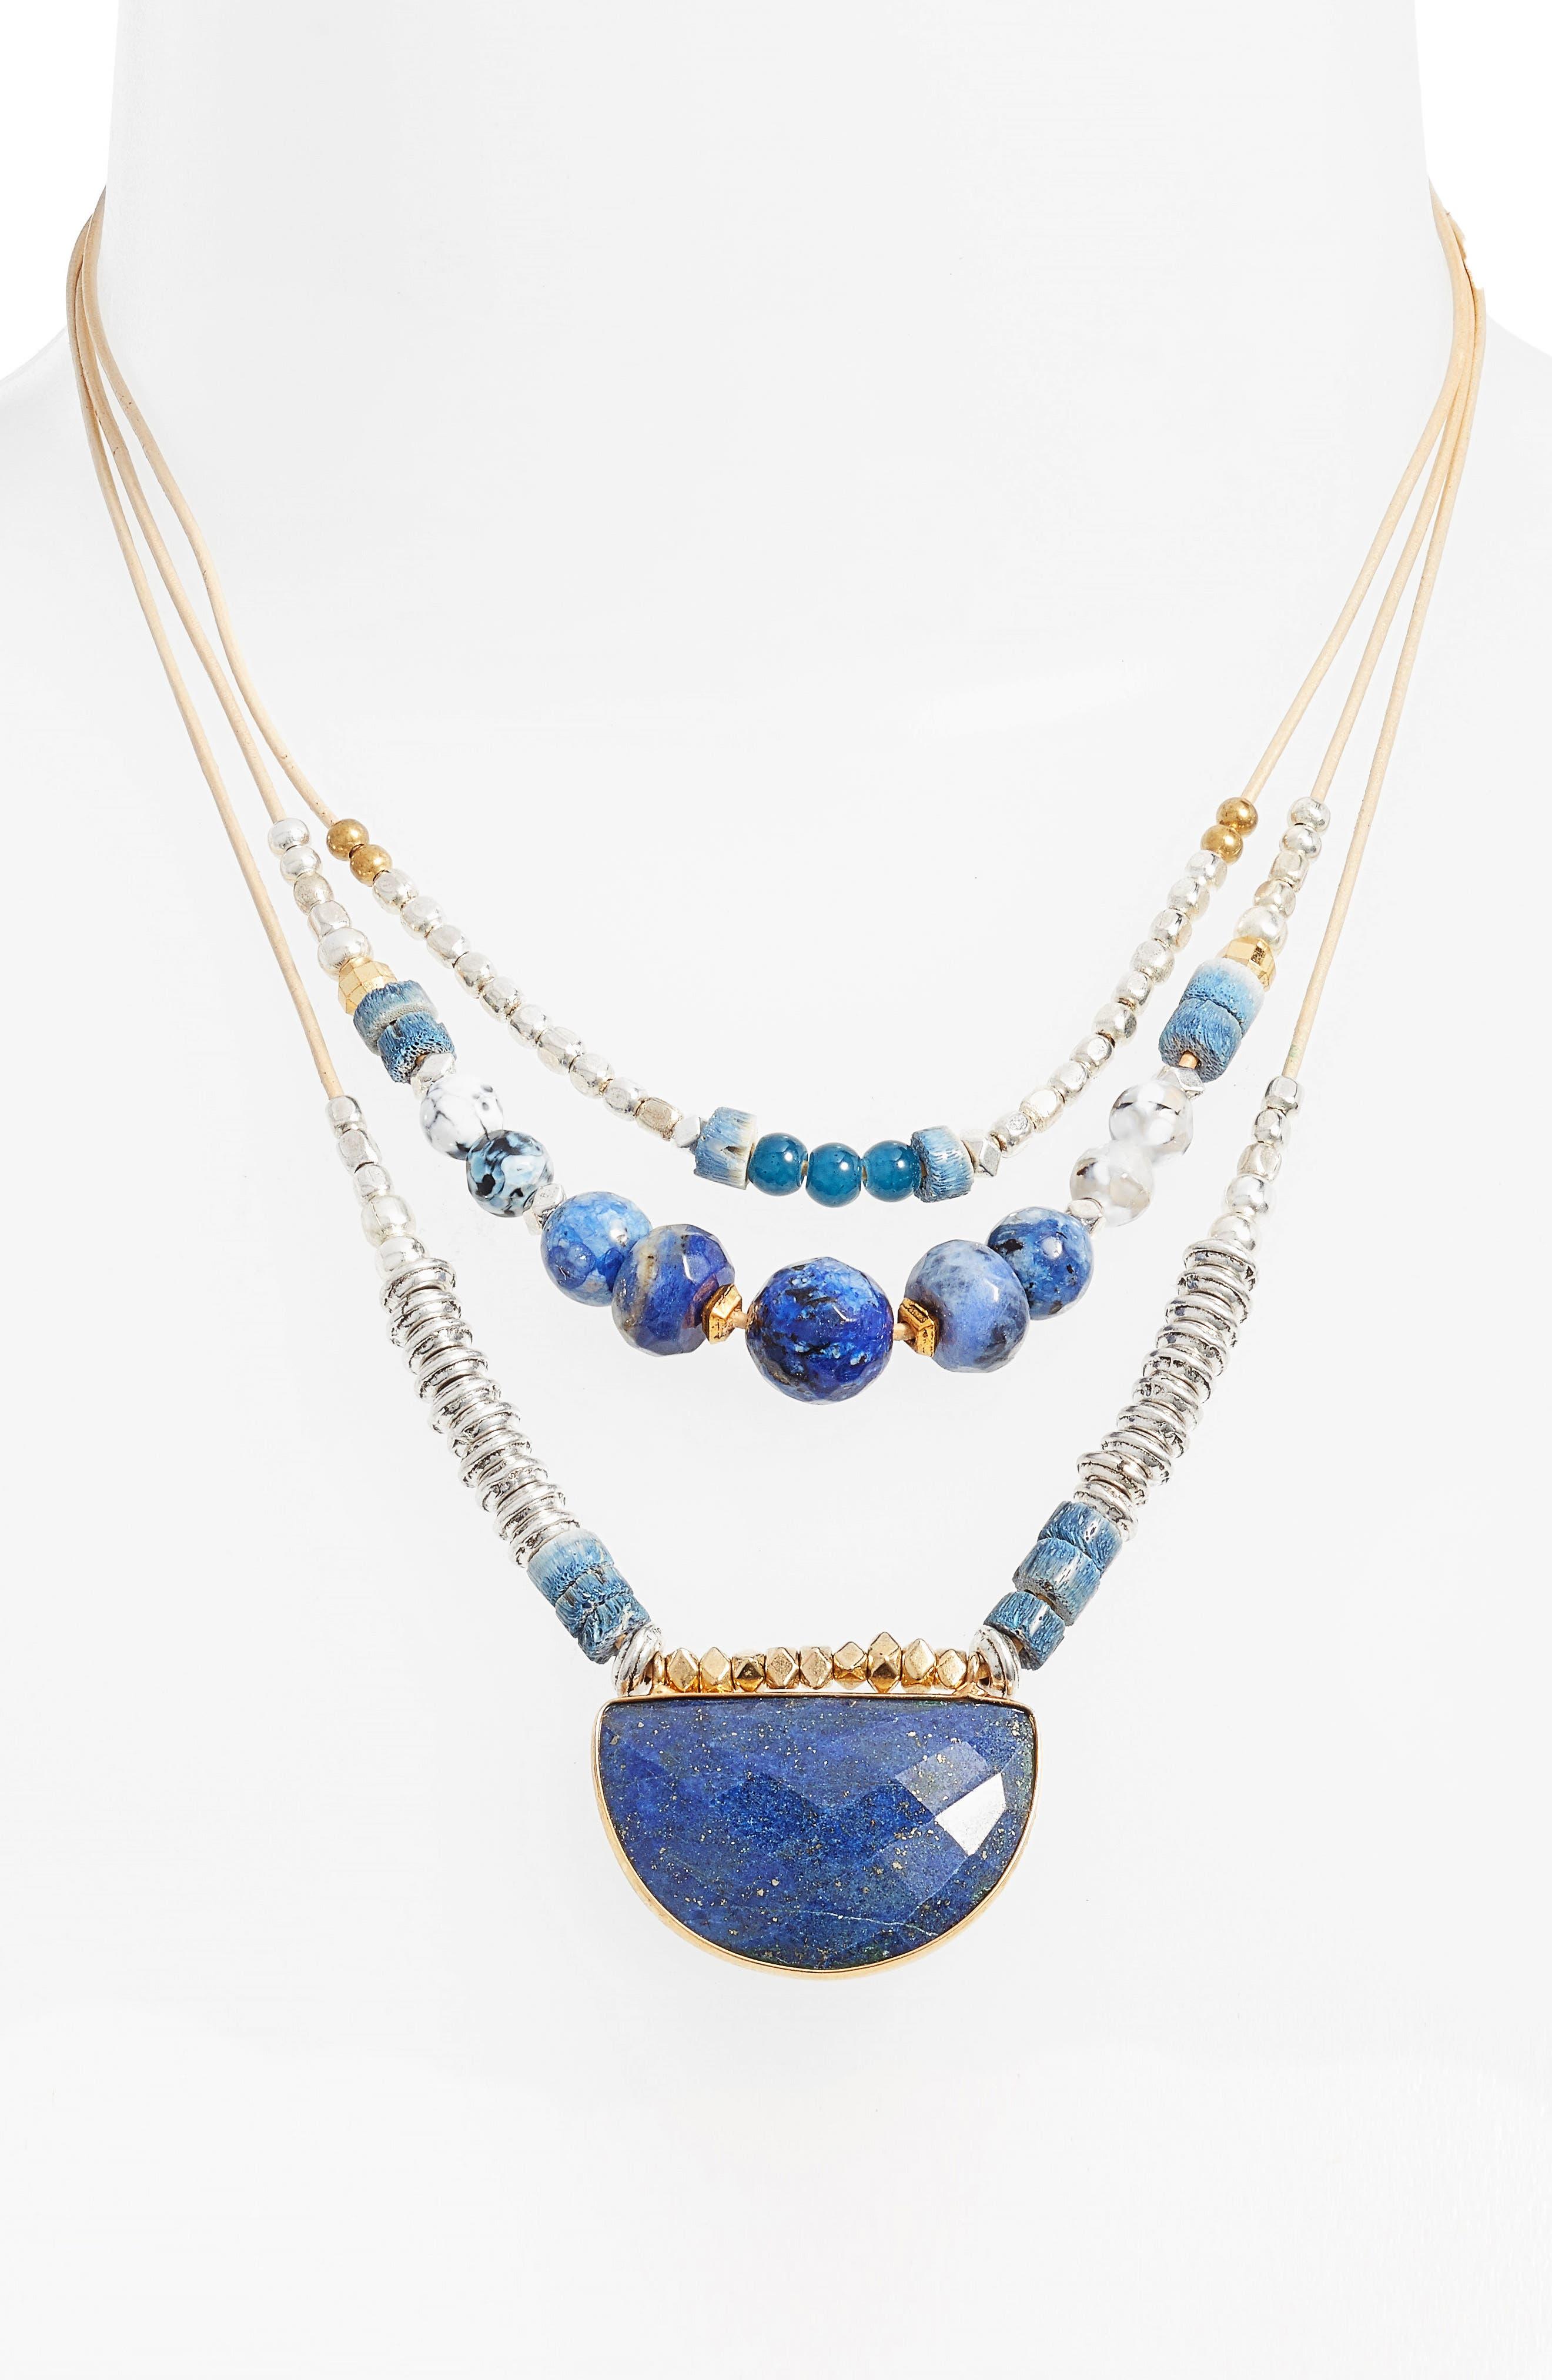 Main Image - Nakamol Design Multilayered Necklace